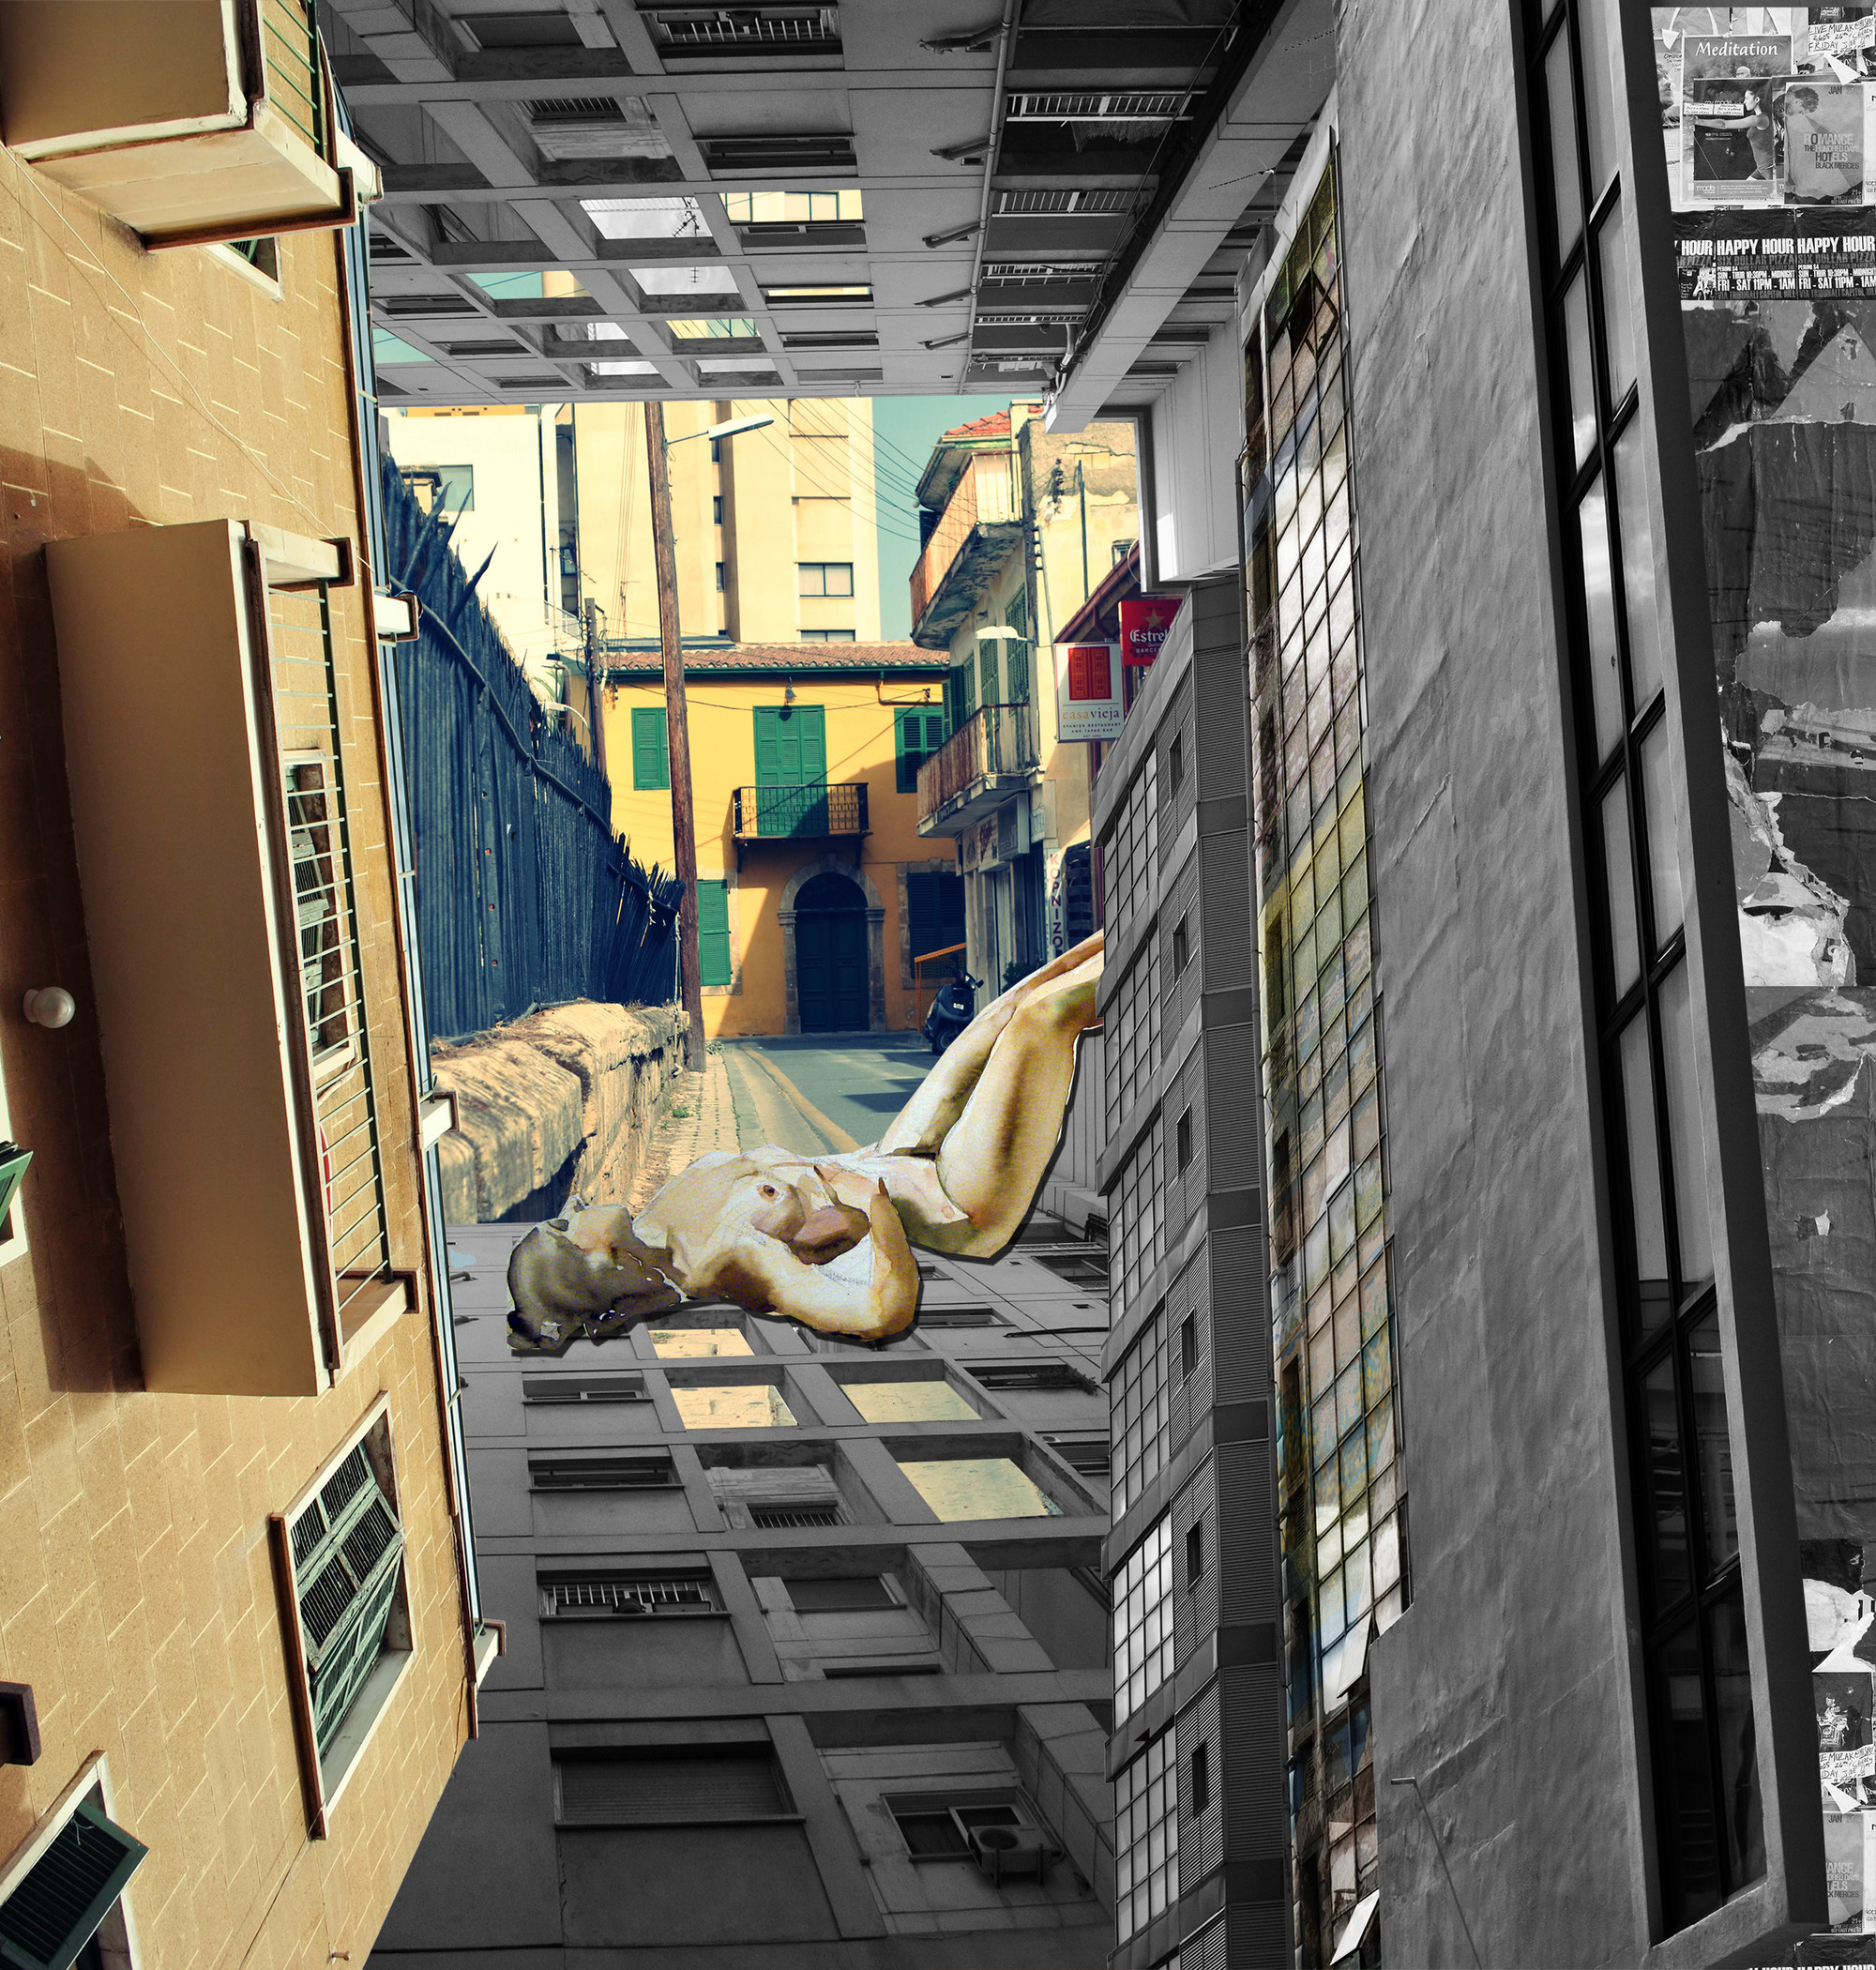 © Michael Hadjistyllis, Stefanos Roimpas / Anatomía histórica mediante un collage (2014)